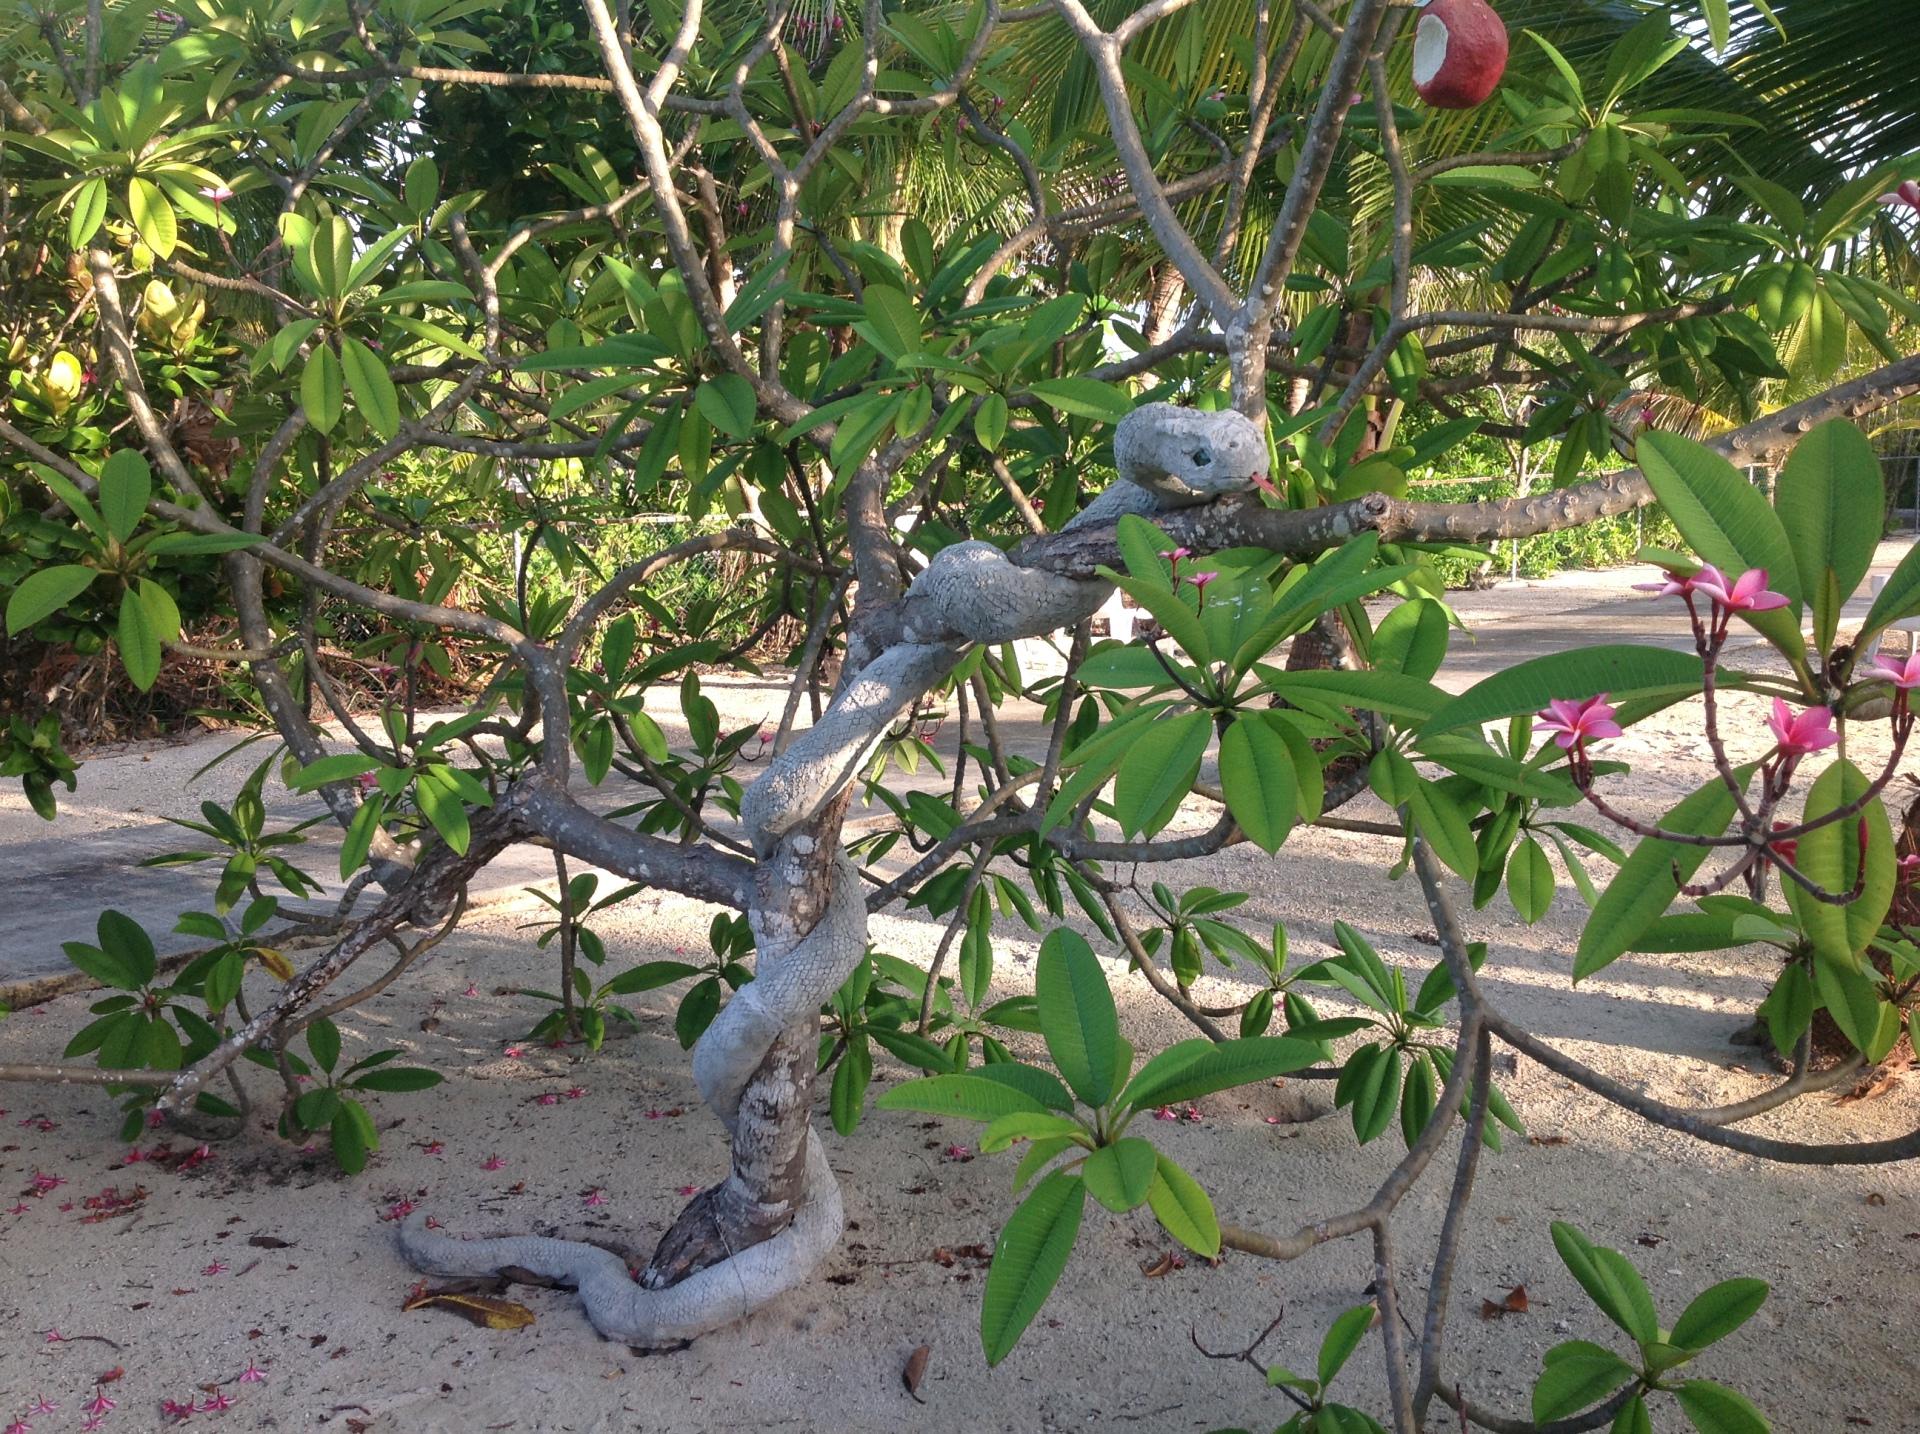 SERPENT IN THE TREE OF KNOWLEDGE IN THE GARDEN OF EDEN